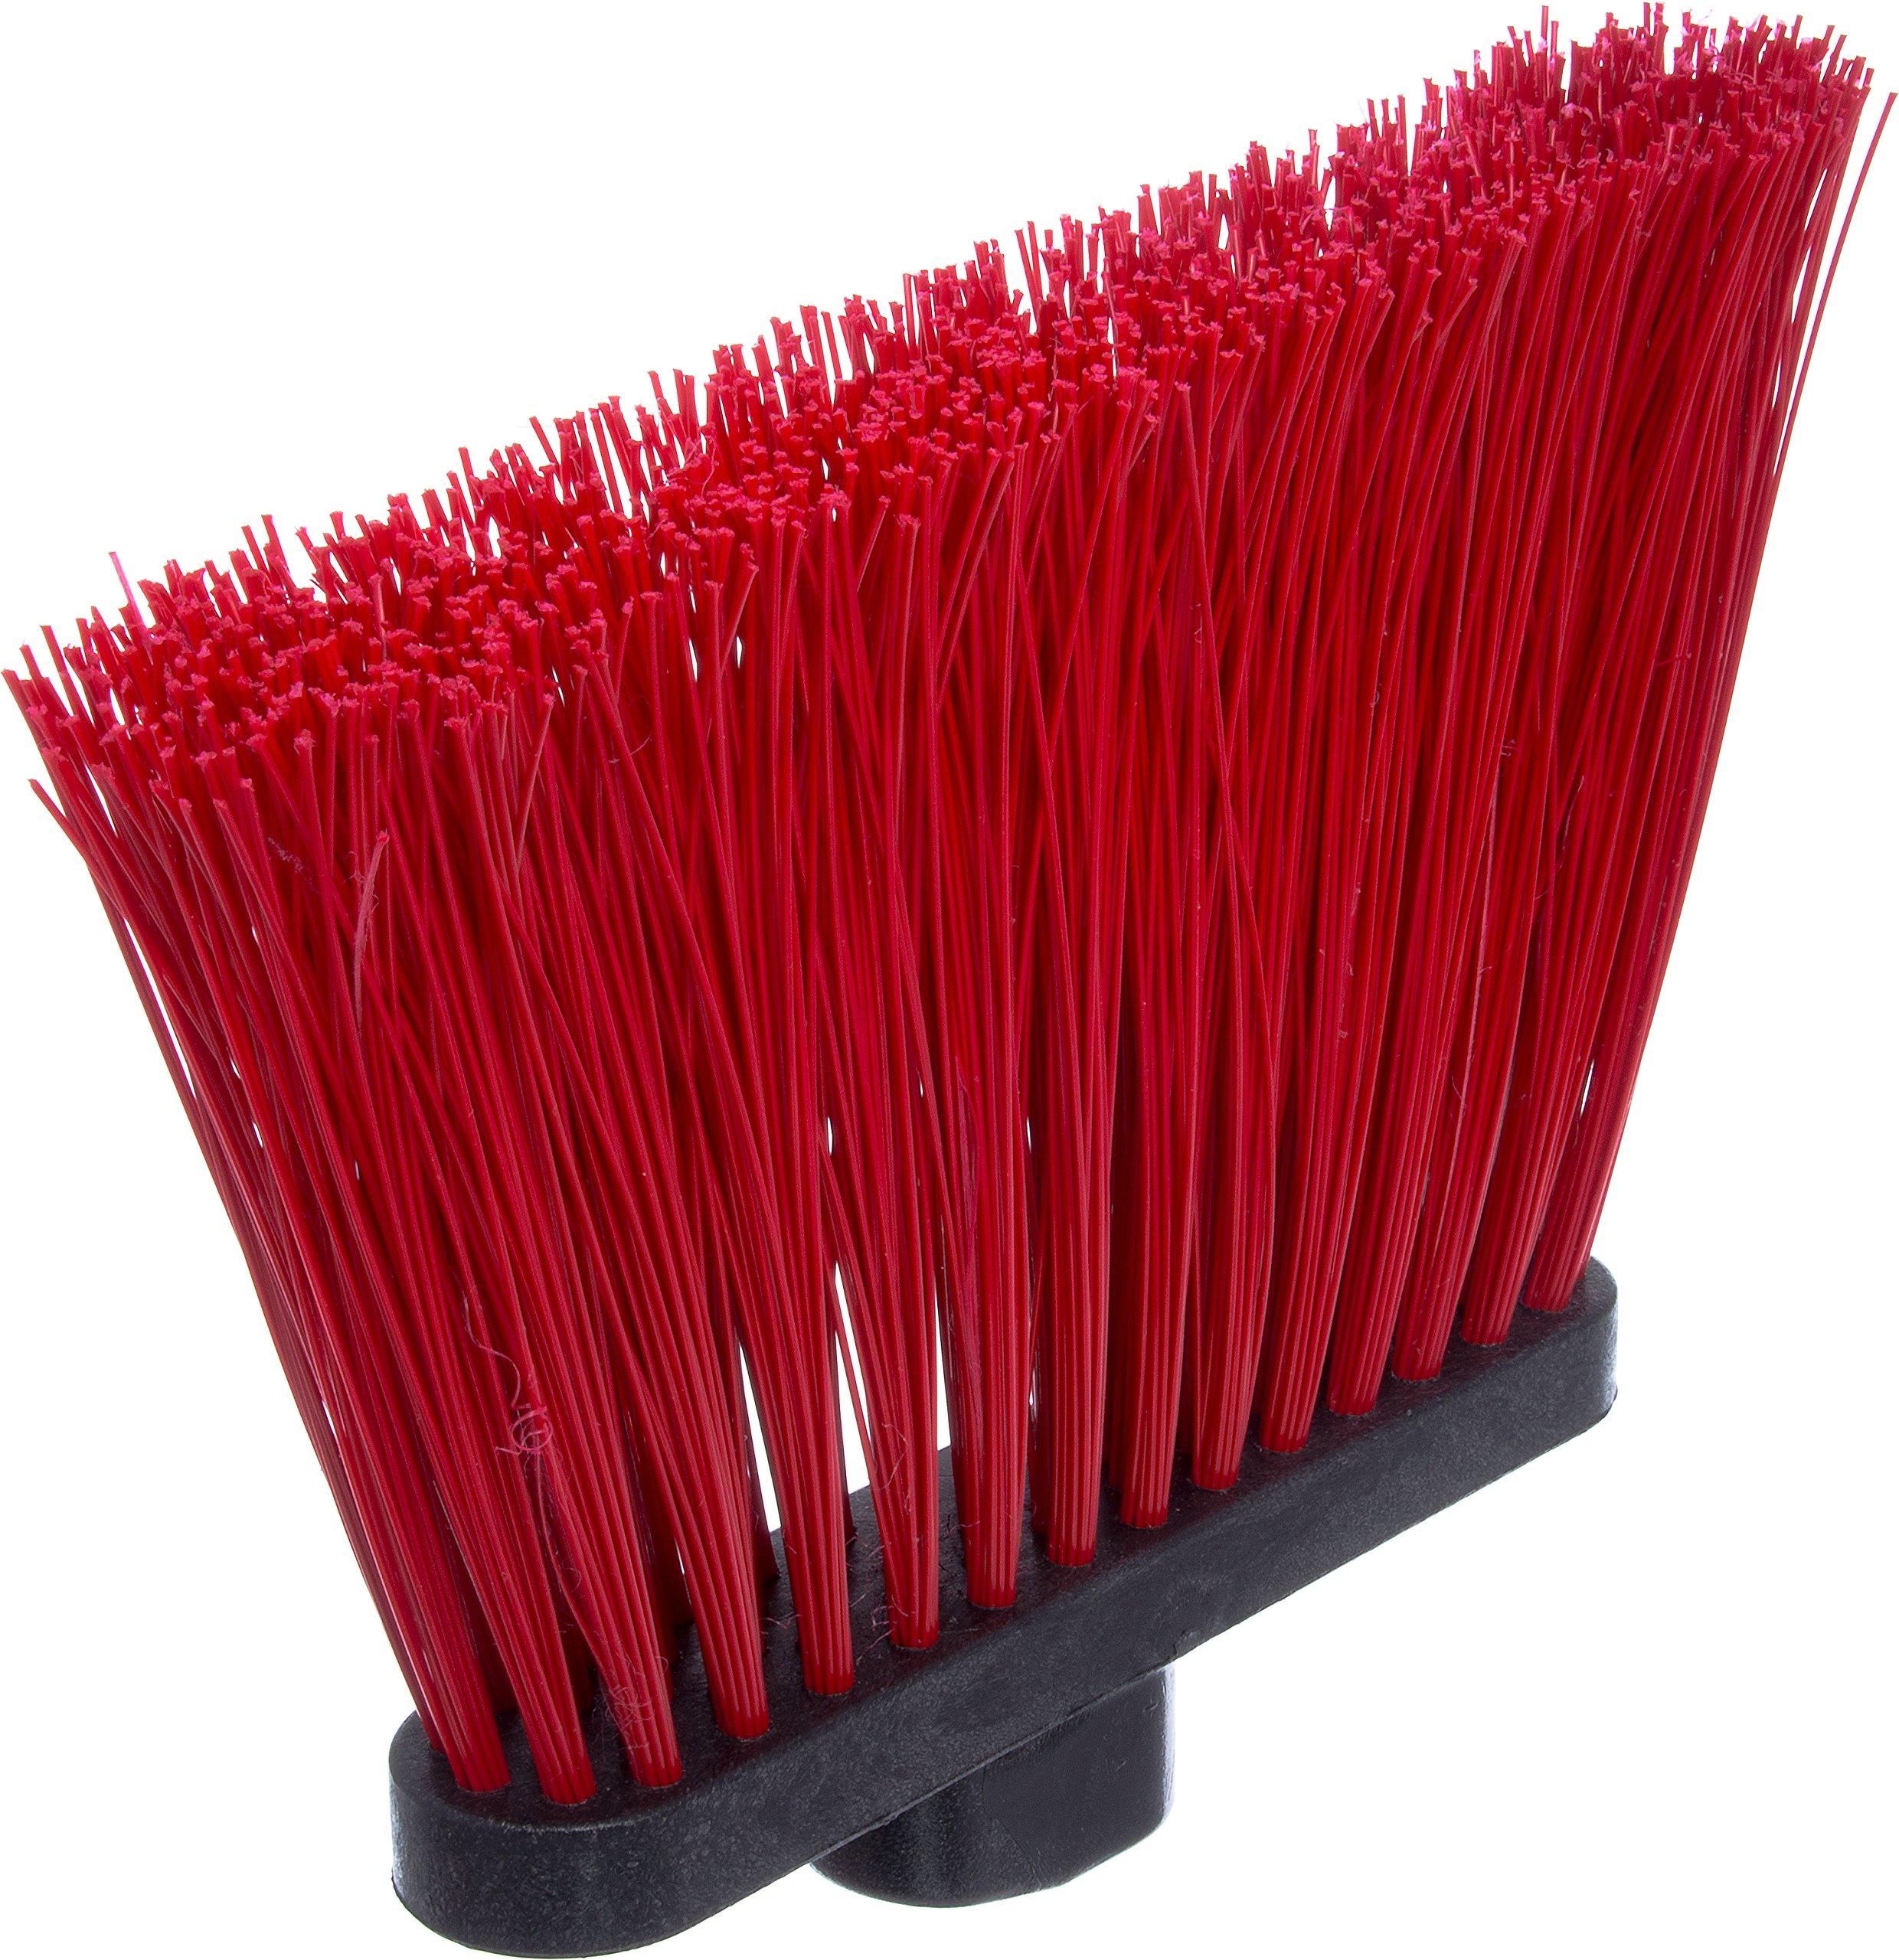 Carlisle 3686805 Duo-Sweep UnFlagged Angle Broom Head, 8'', Red by Carlisle (Image #3)